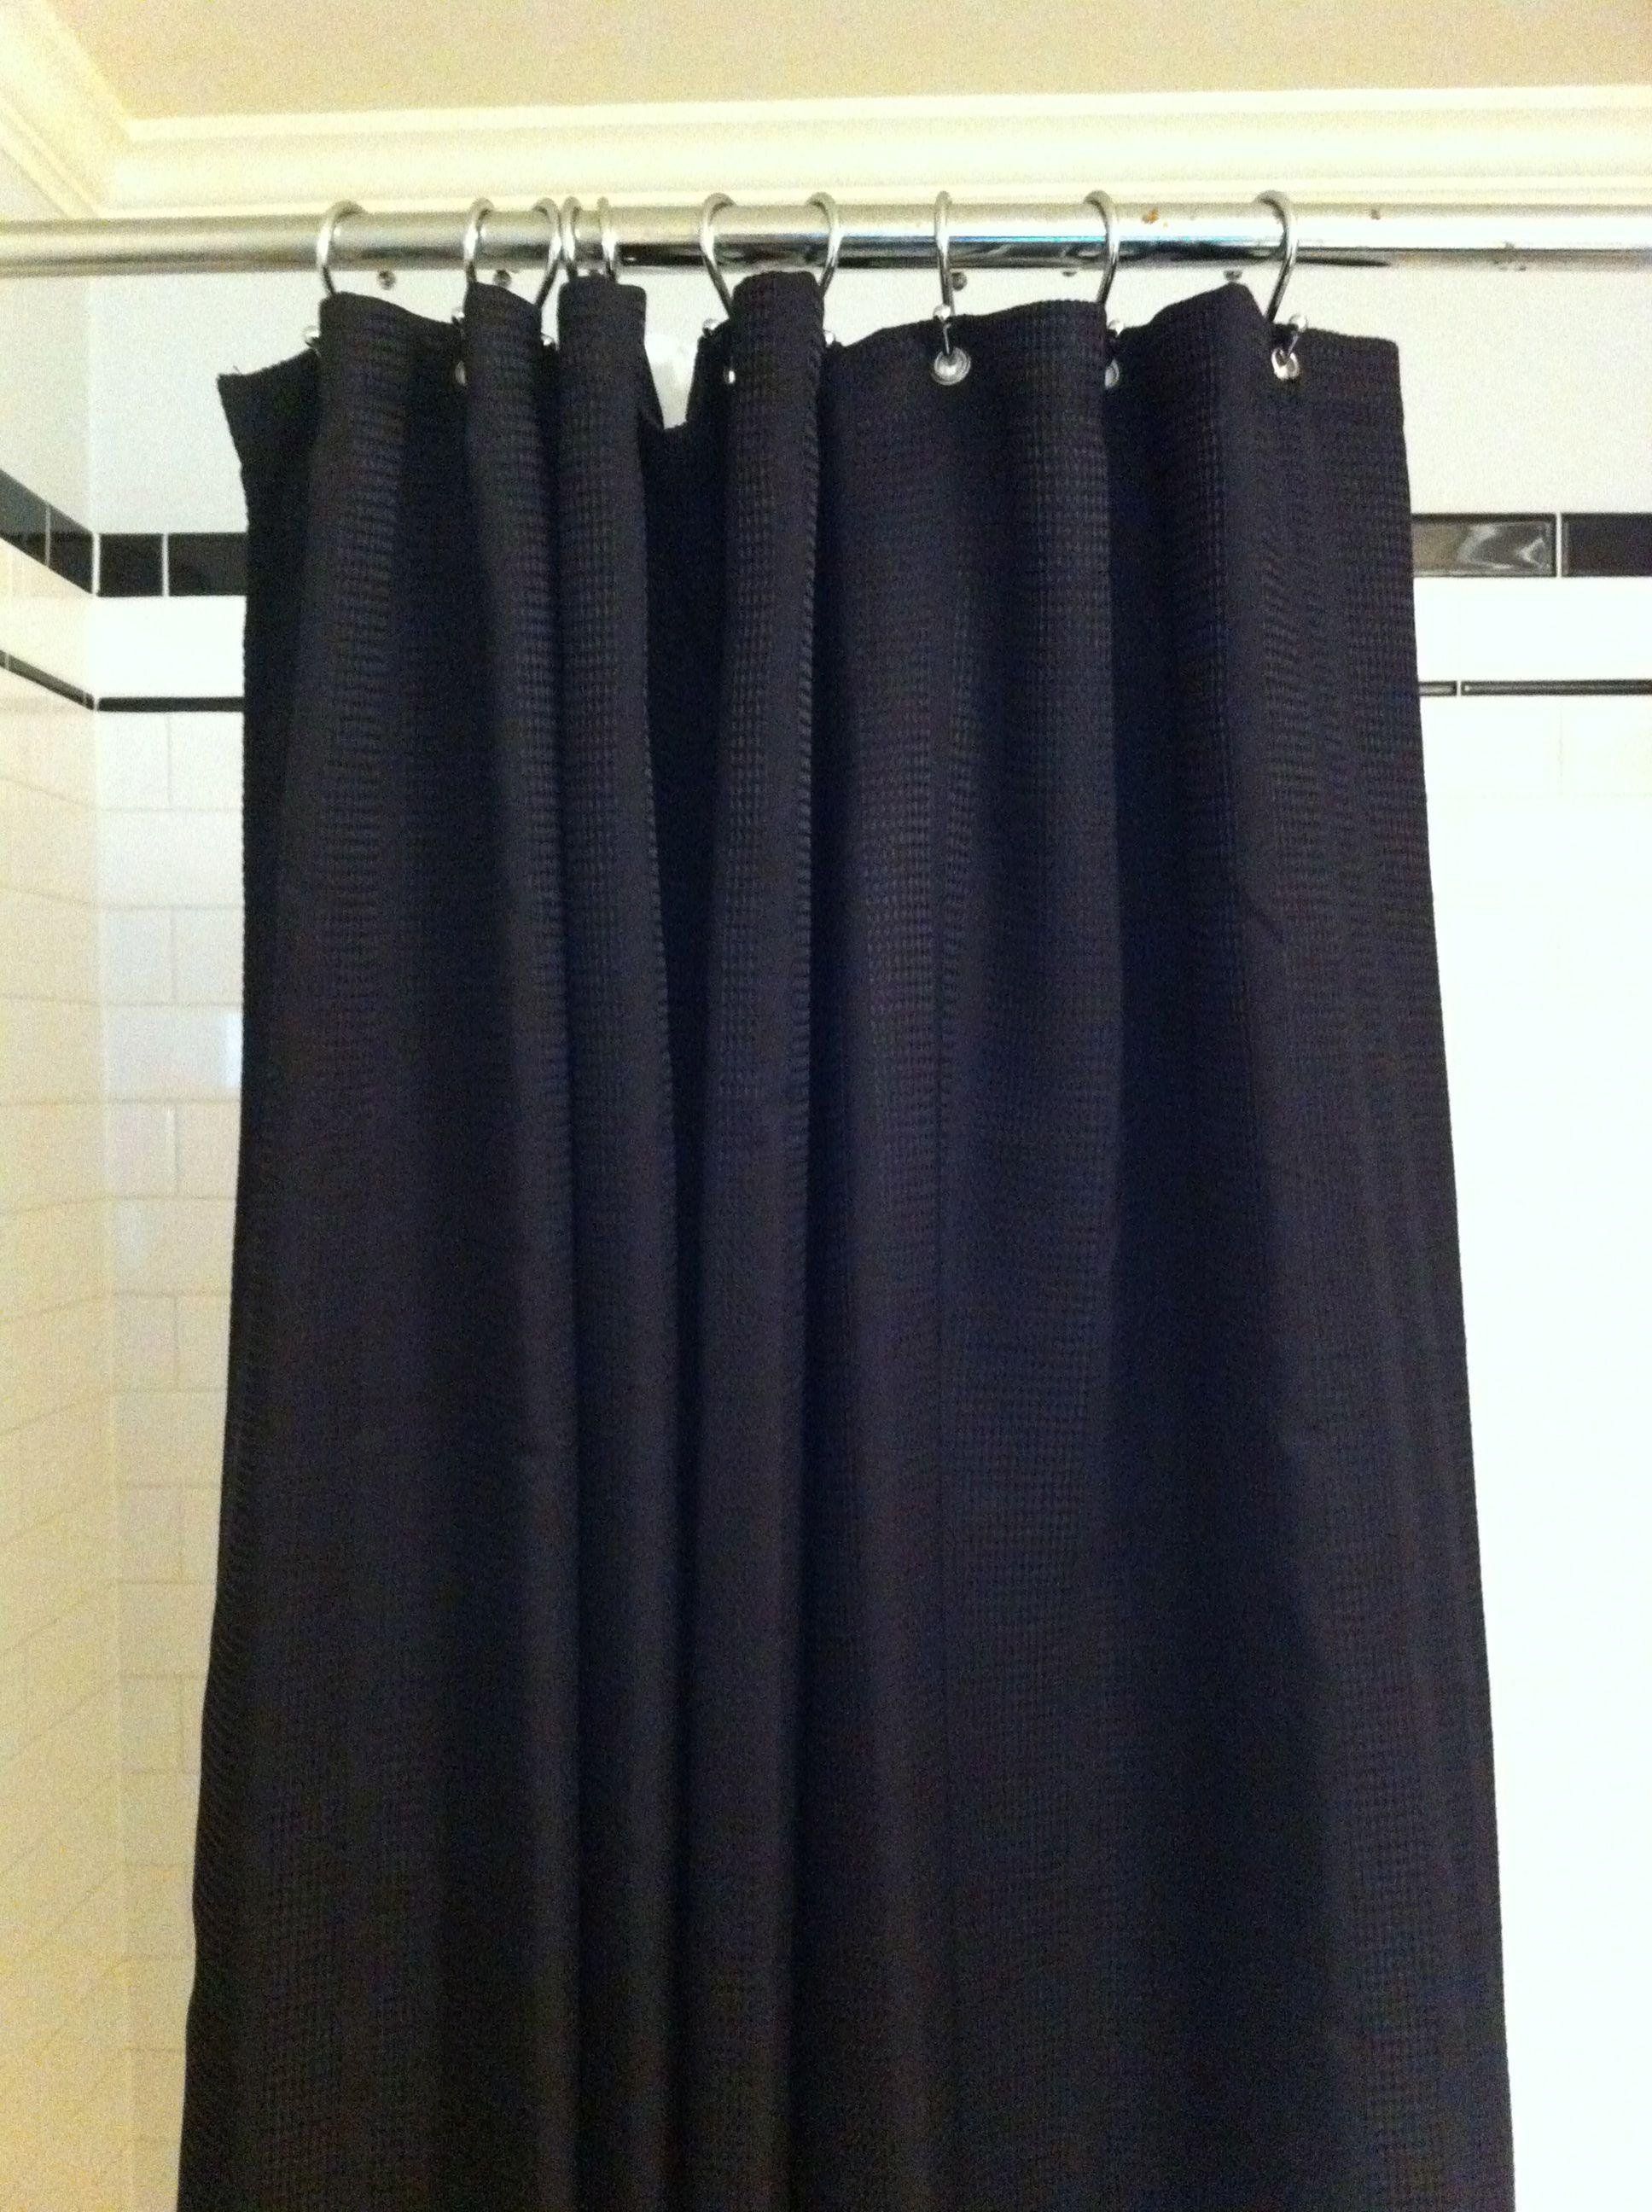 Black Shower Curtains For Sale | butik.work